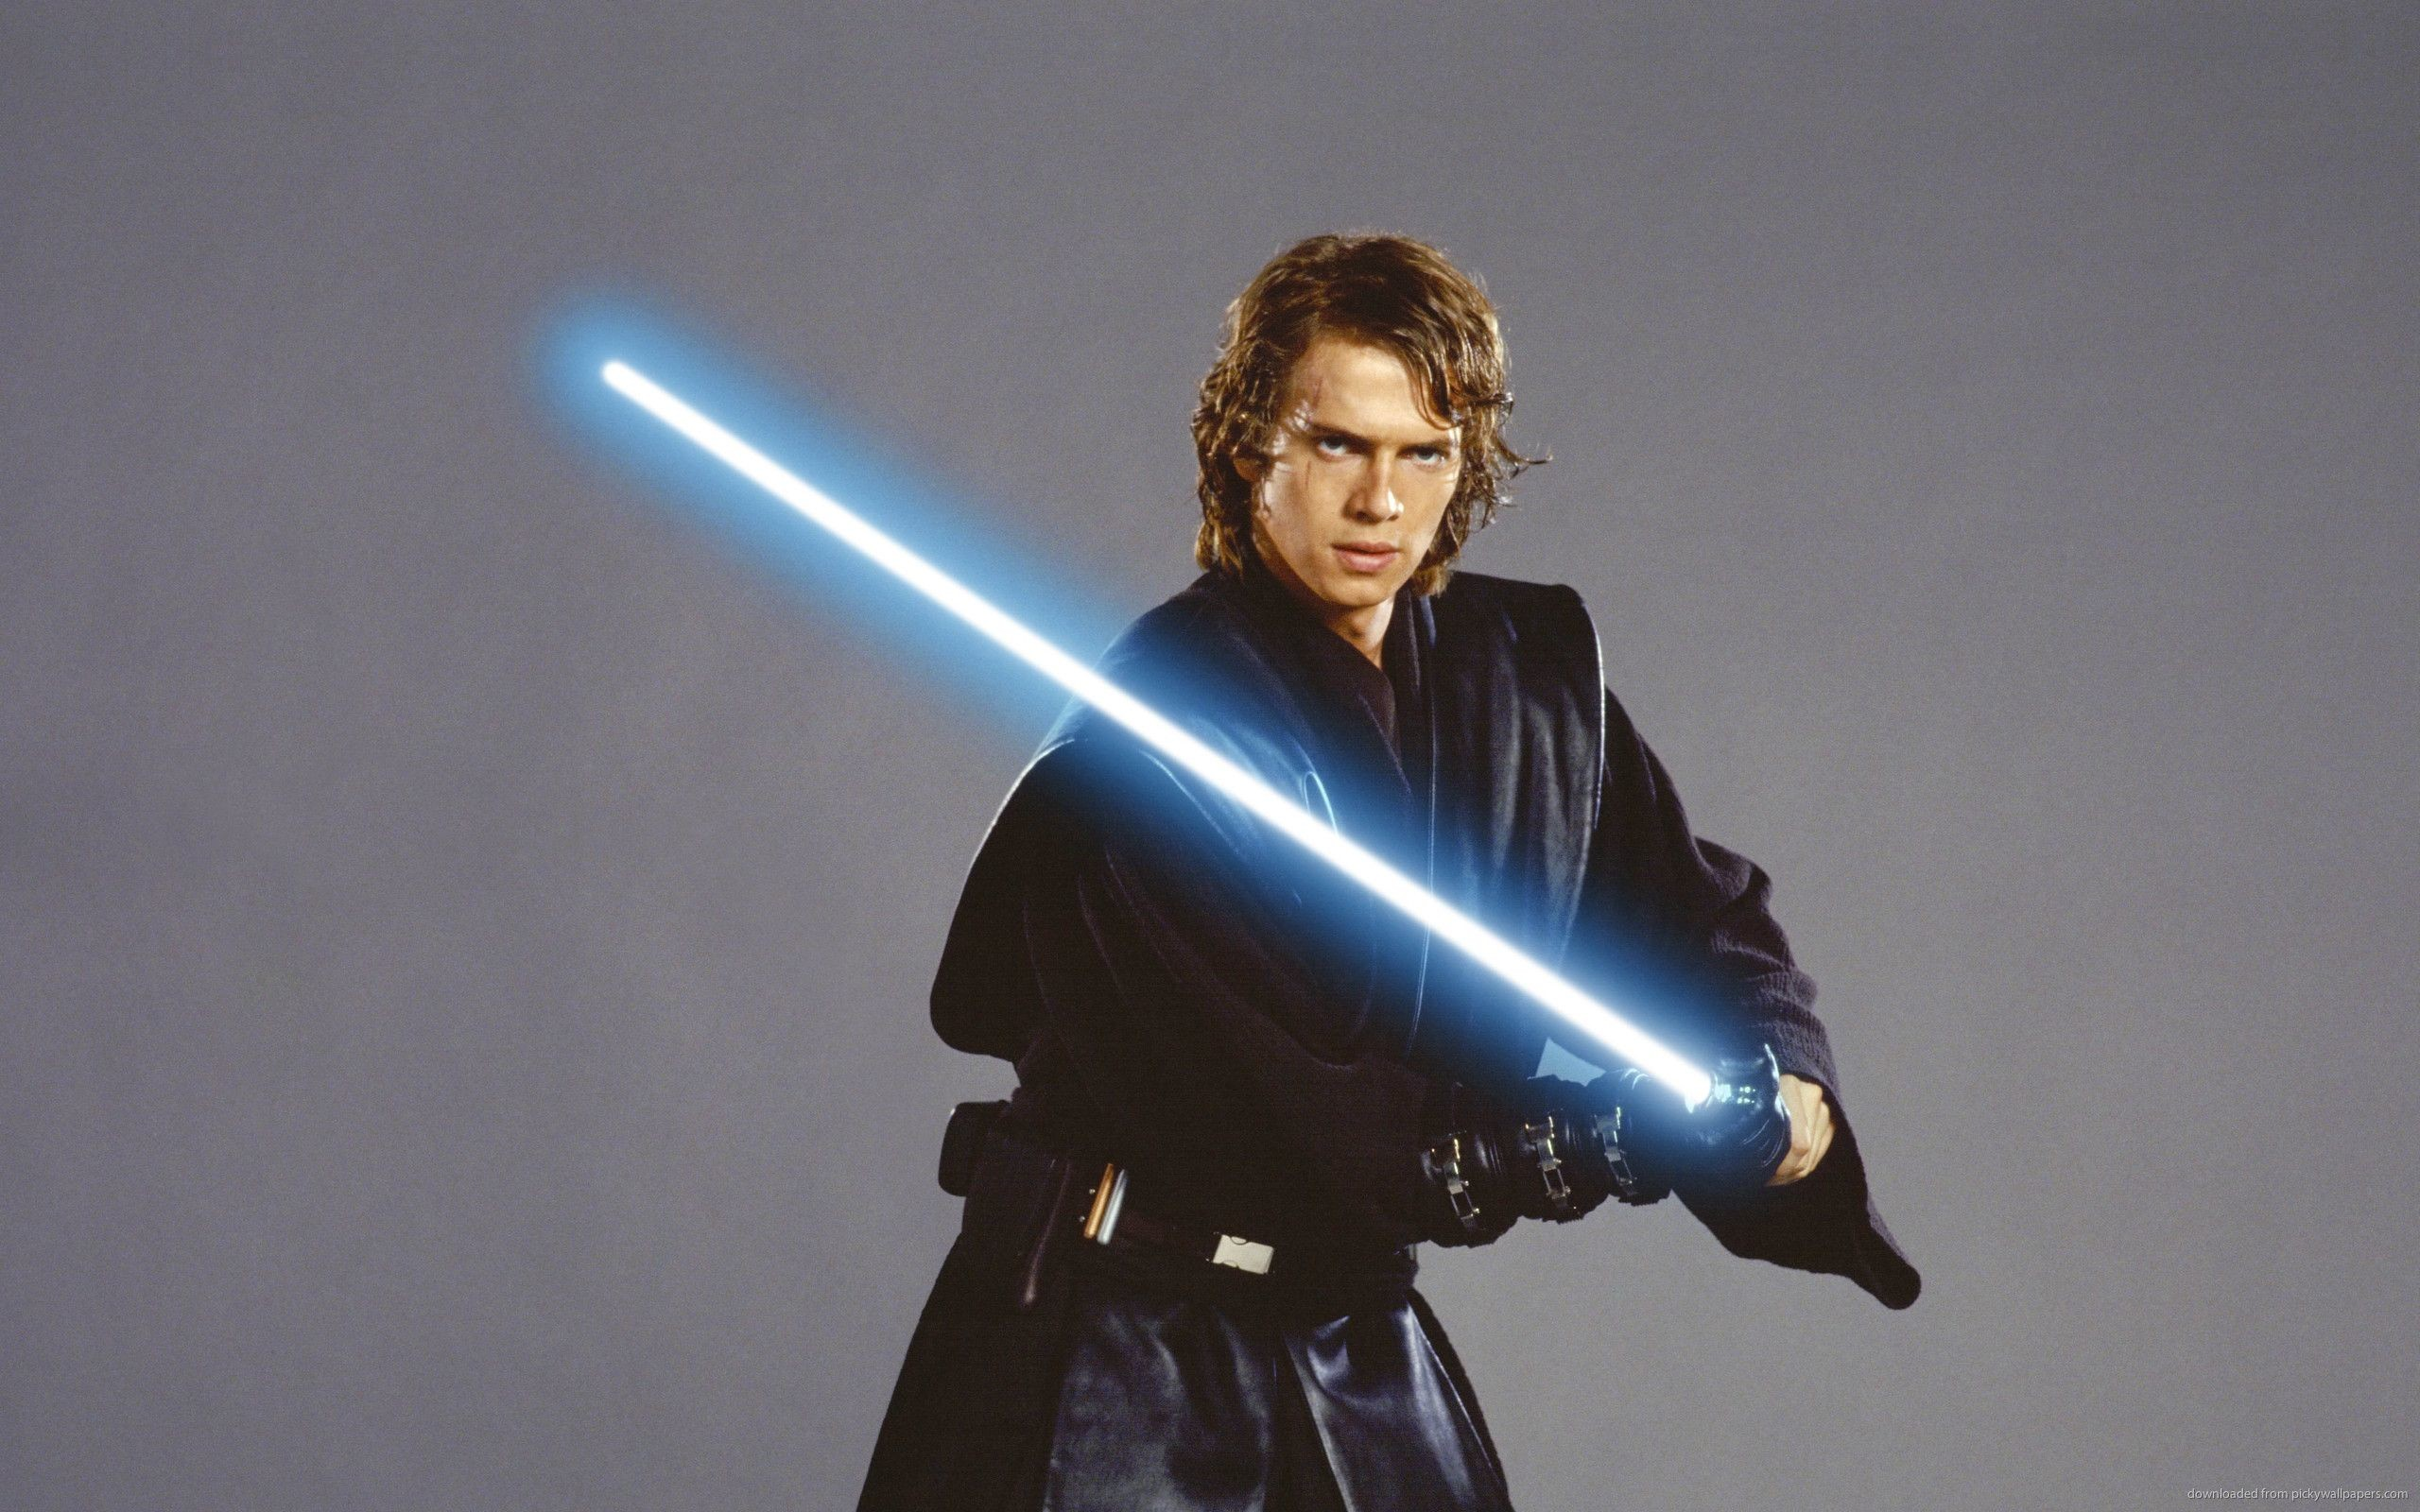 2560x1600 Star Wars Anakin Skywalker Wallpaper